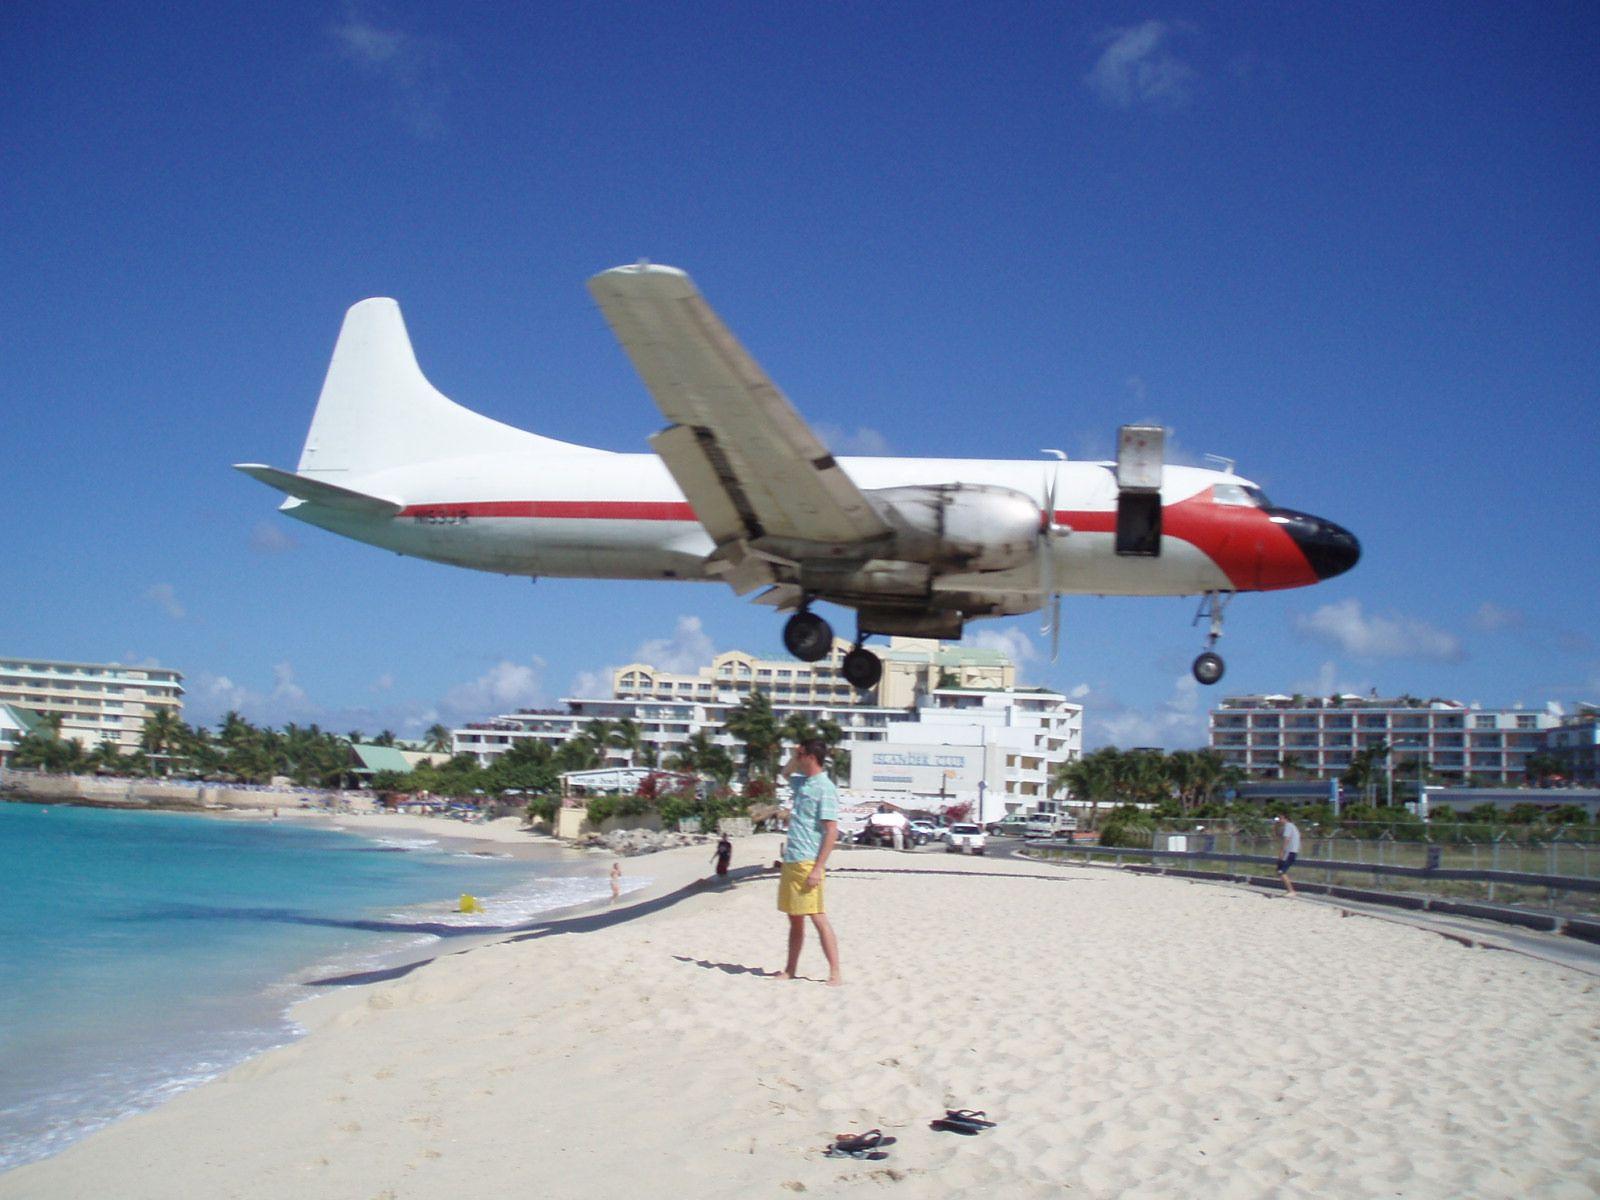 Maho Beach Chipmunker Wrote Re Sxm Maho Beach Plane Watching 2008 St Maarten Is The Door Supposed To Be Open